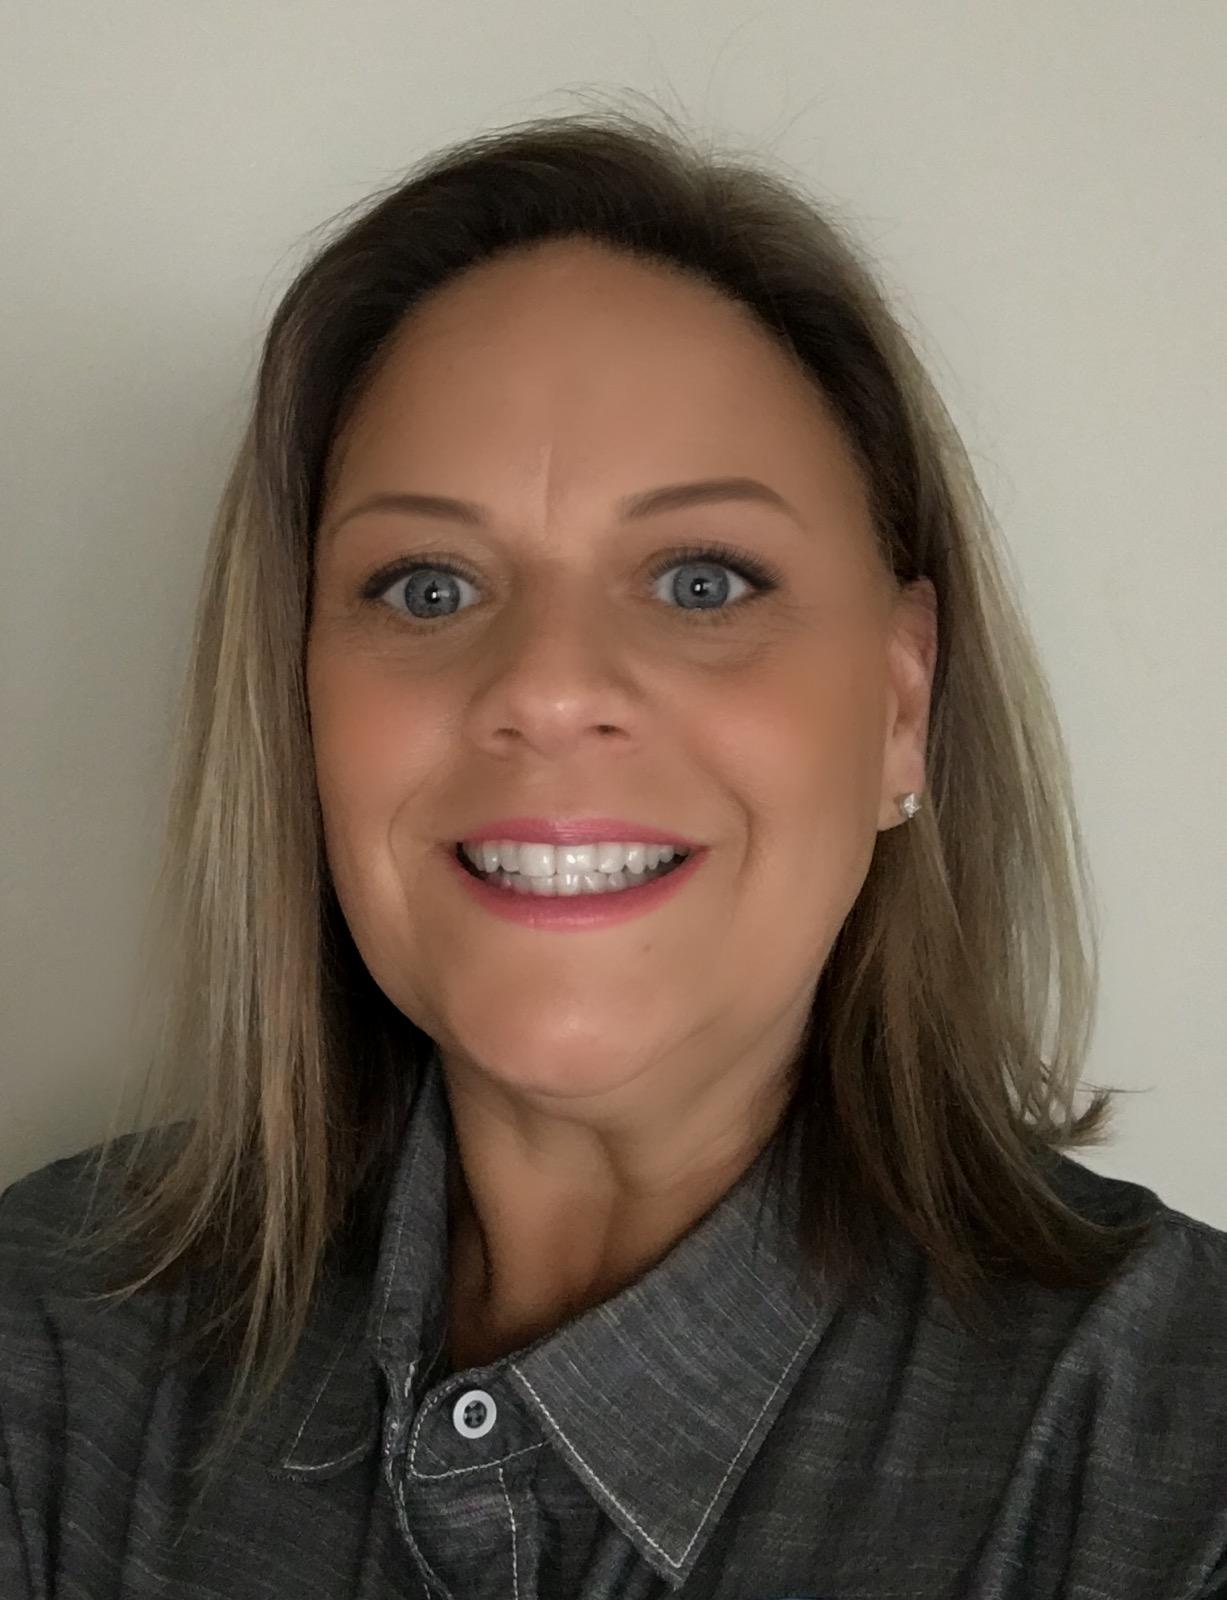 Catherine Buboltz